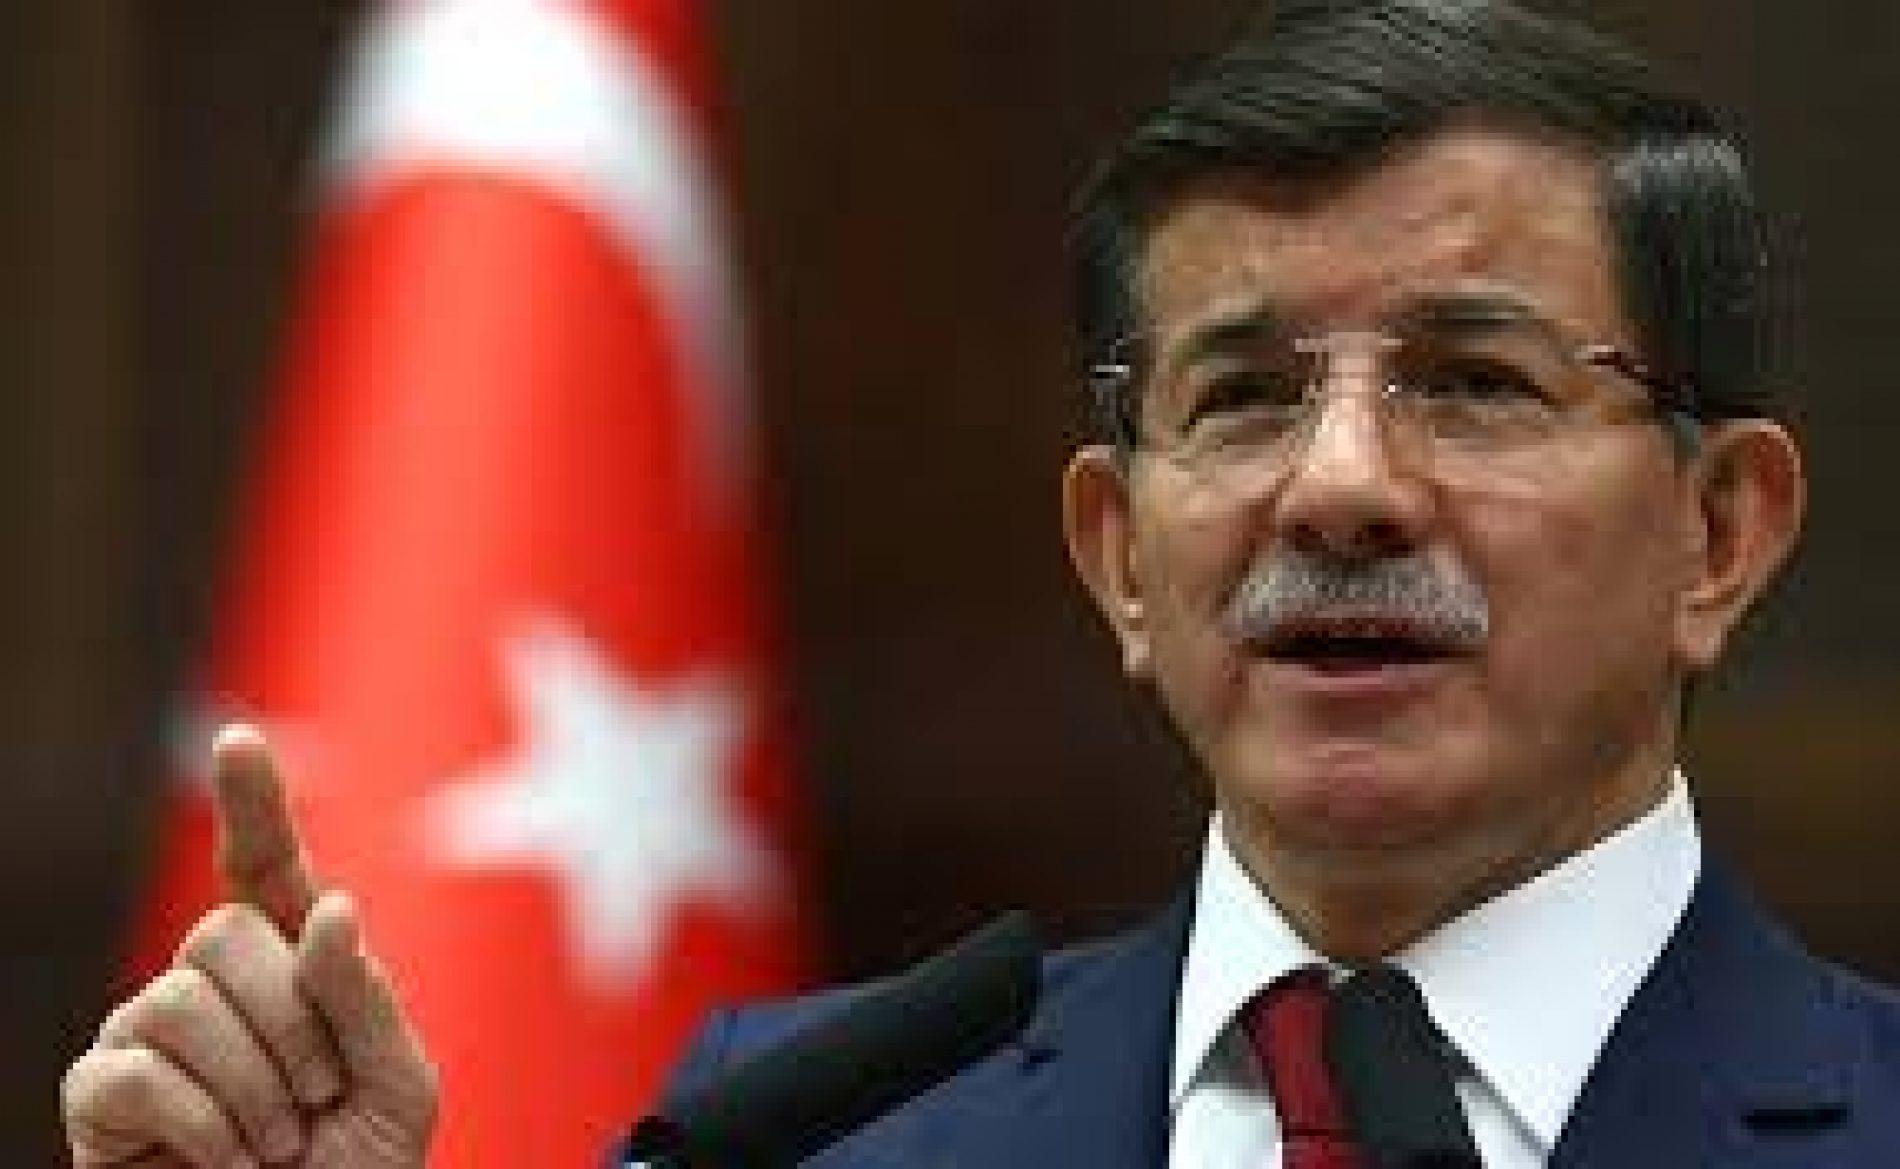 Jep dorëheqje kryeministri Ahmet Davutoglu